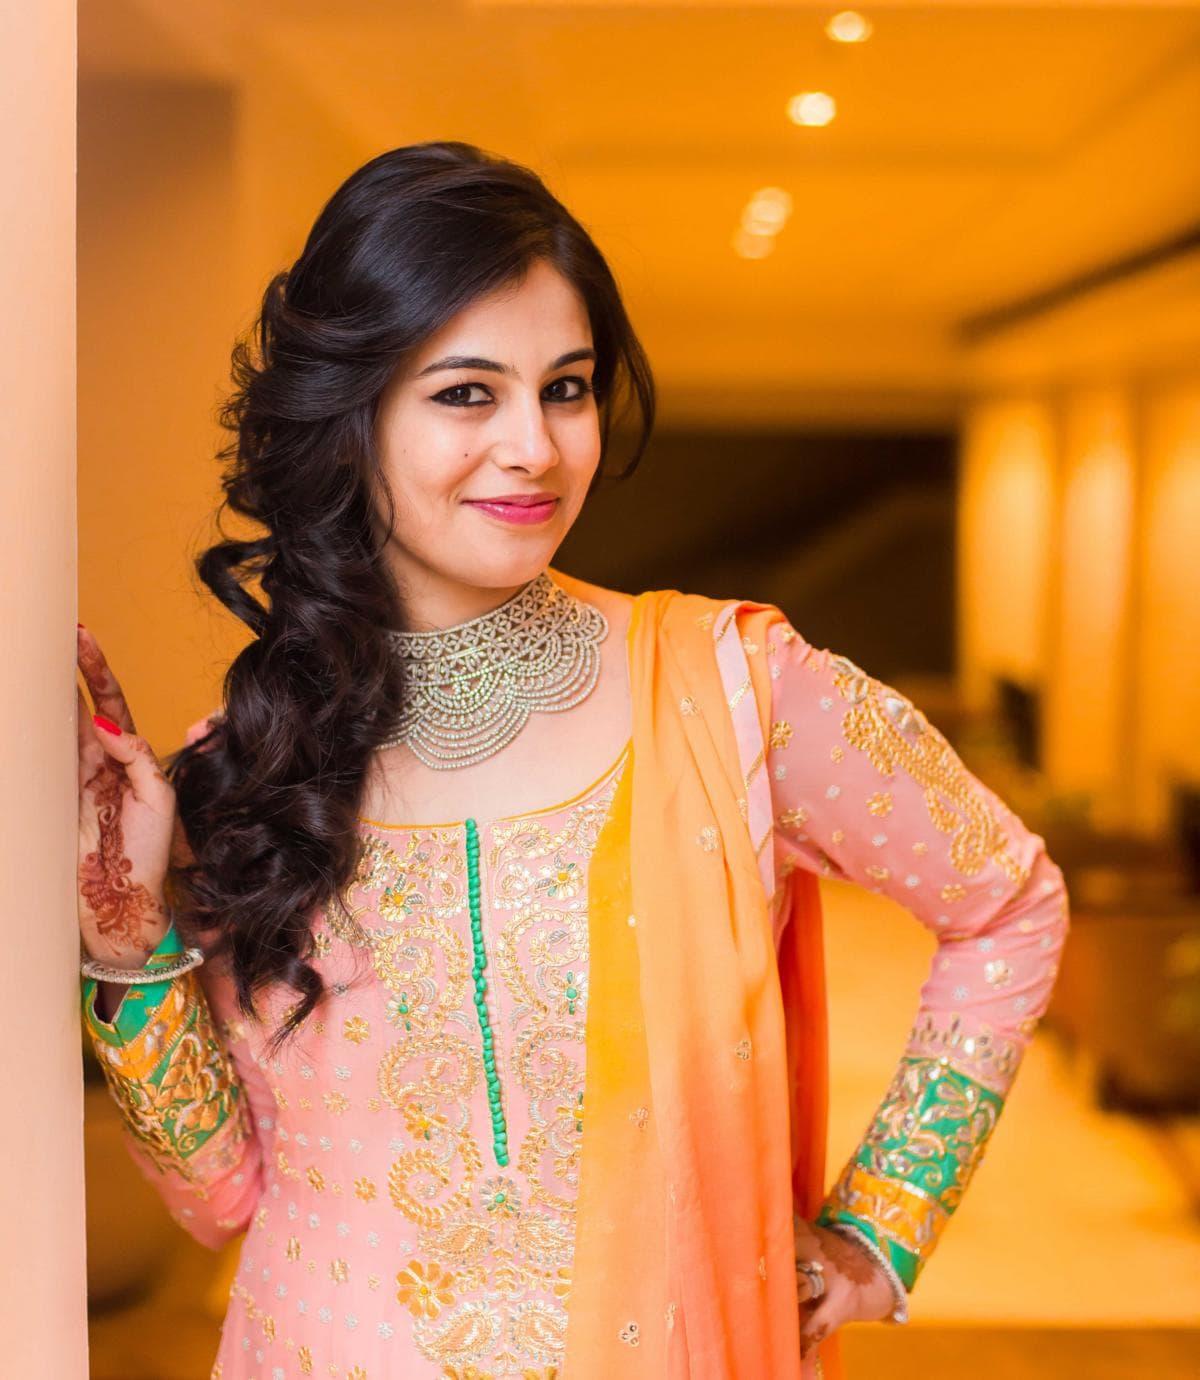 wedding clicks:kuntal mukherjee photography